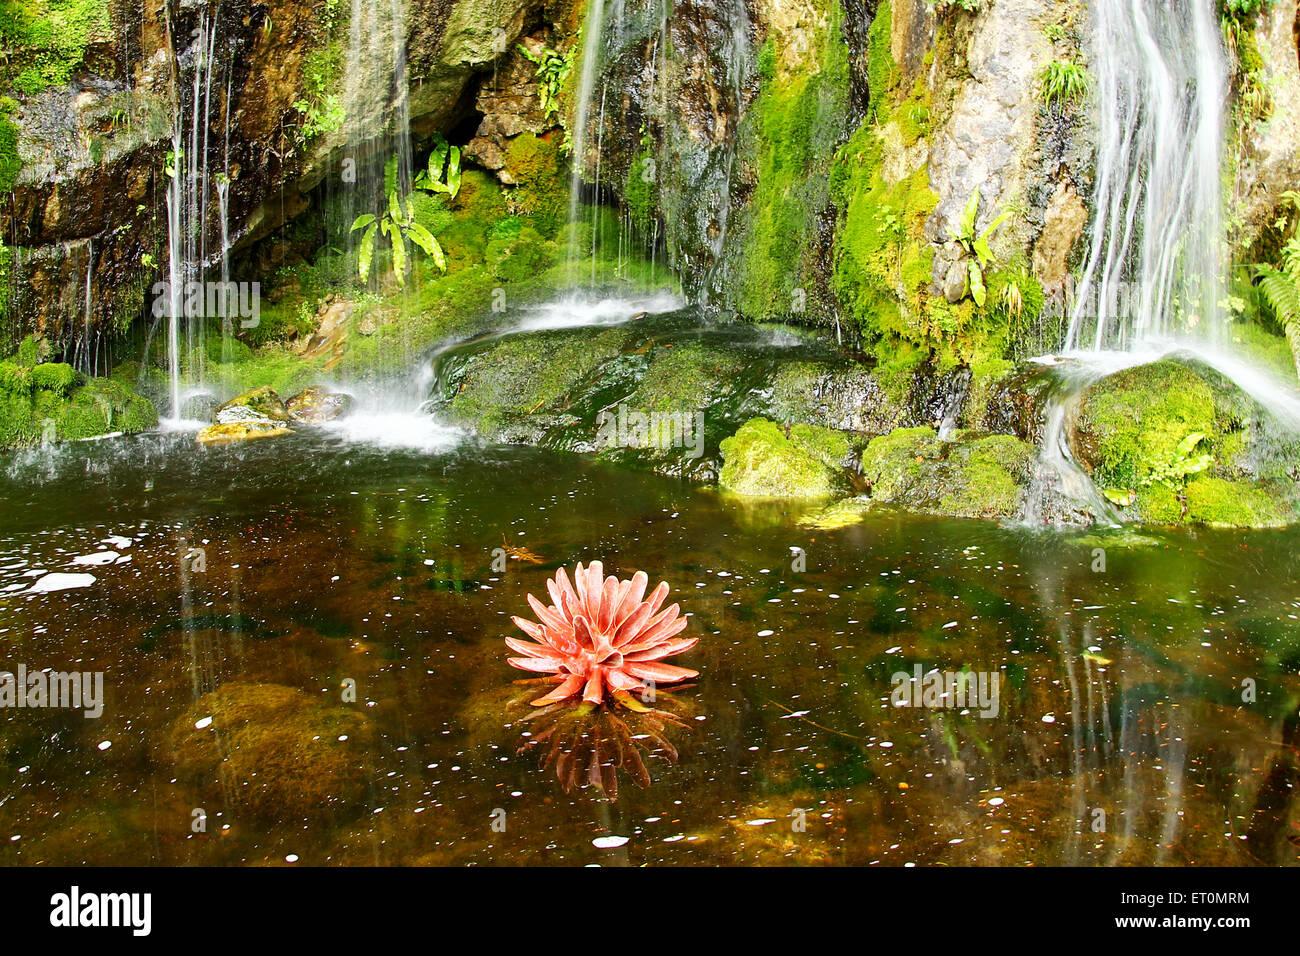 Magical Garden Waterfalls   Stock Image